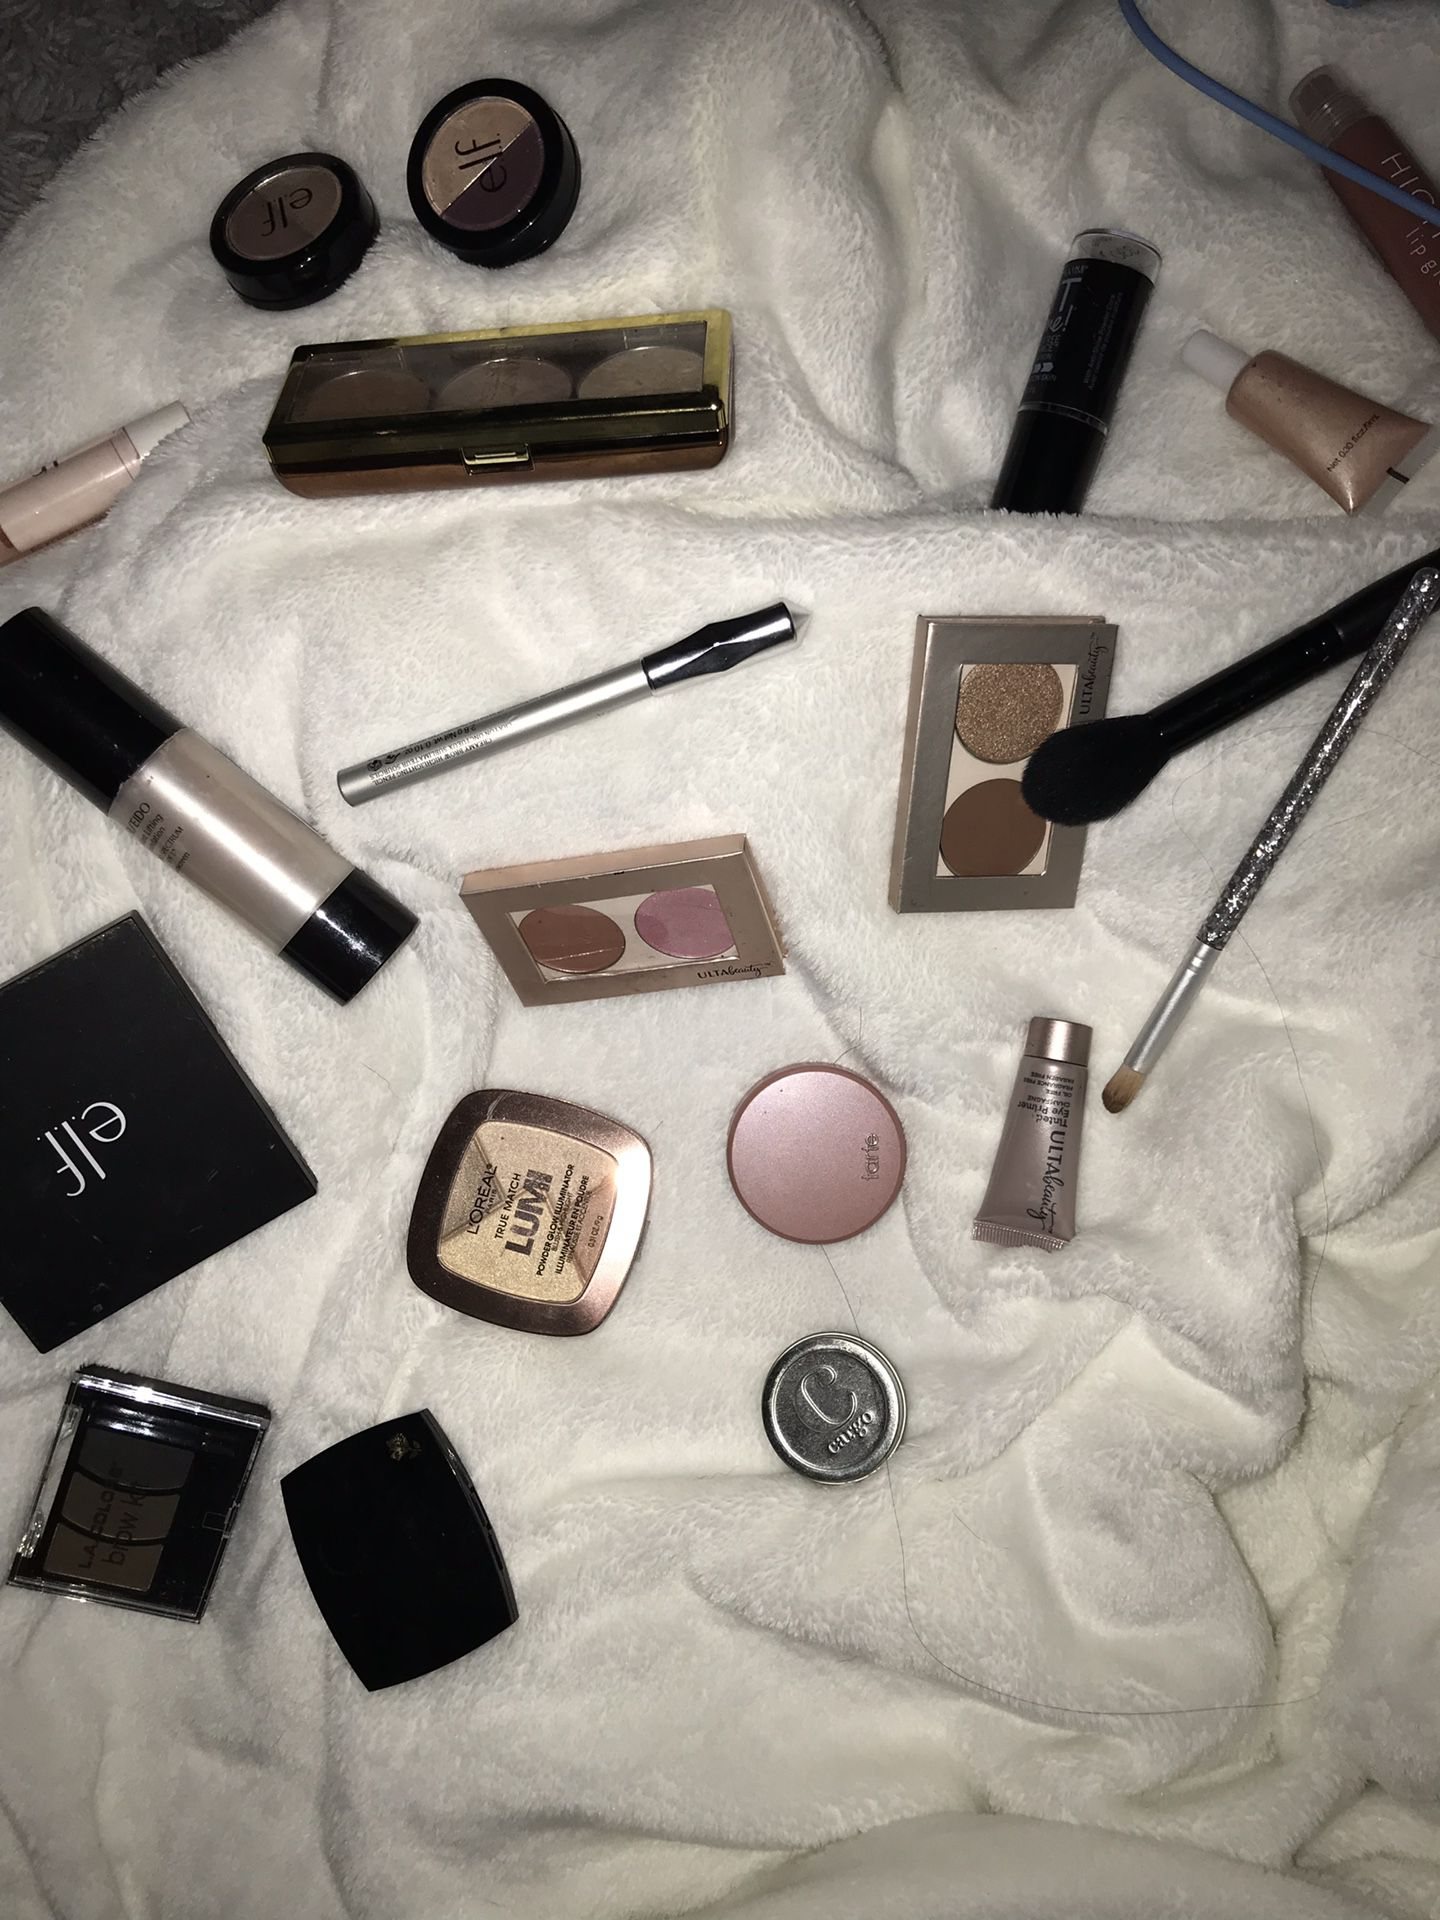 Lots of random makeup products